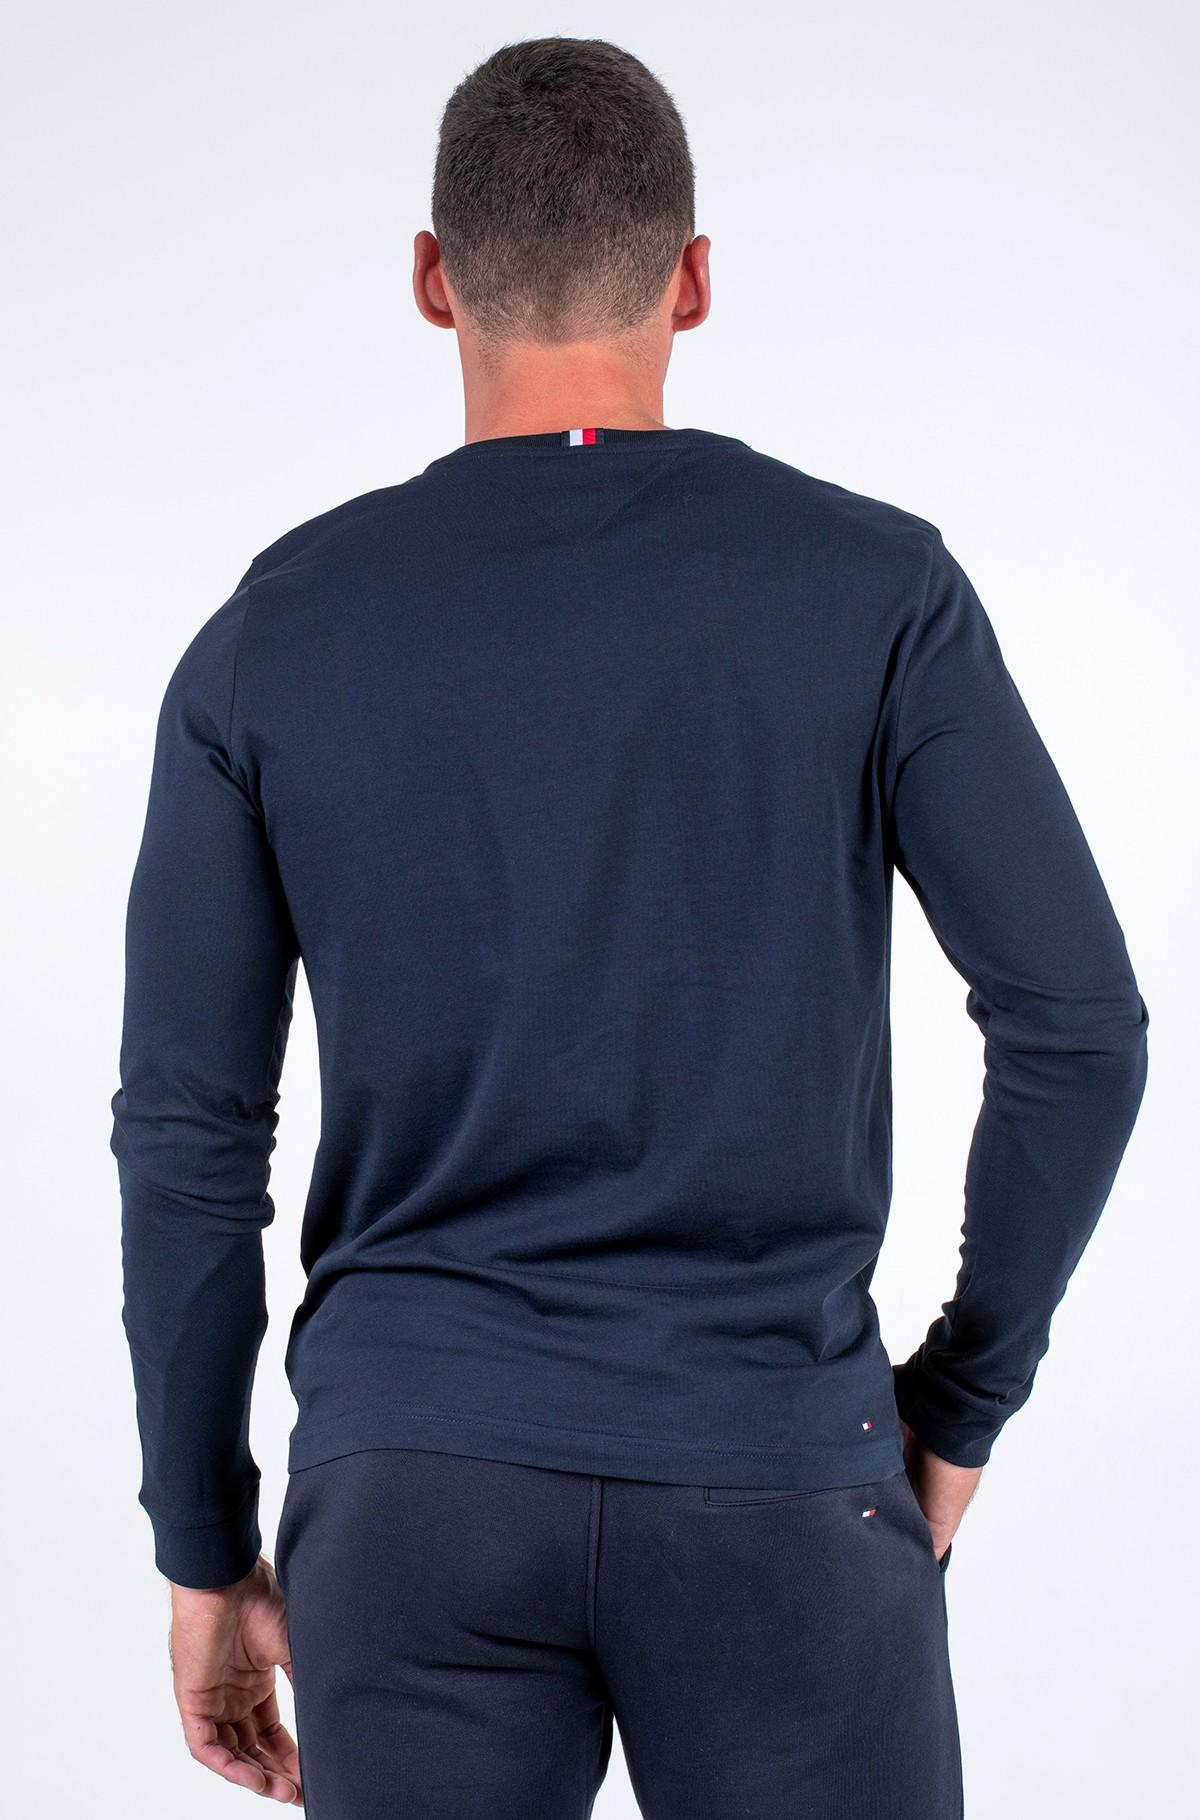 T-krekls ar garām piedurknēm  HILFIGER LOGO LONG SLEEVE TEE-full-2